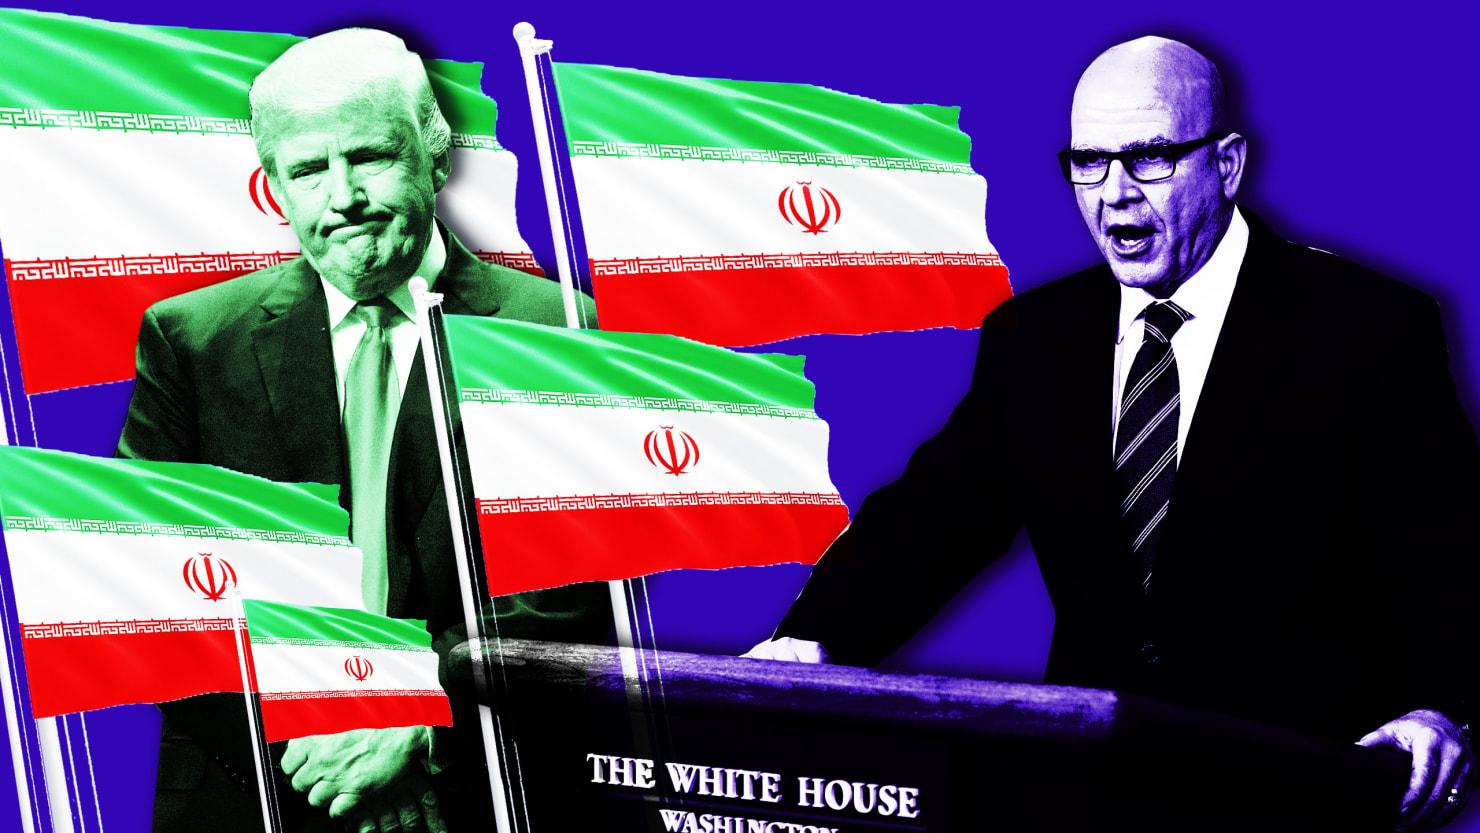 Iran's Running Circles Around Trump—But McMaster Thinks the Press Can Save Him